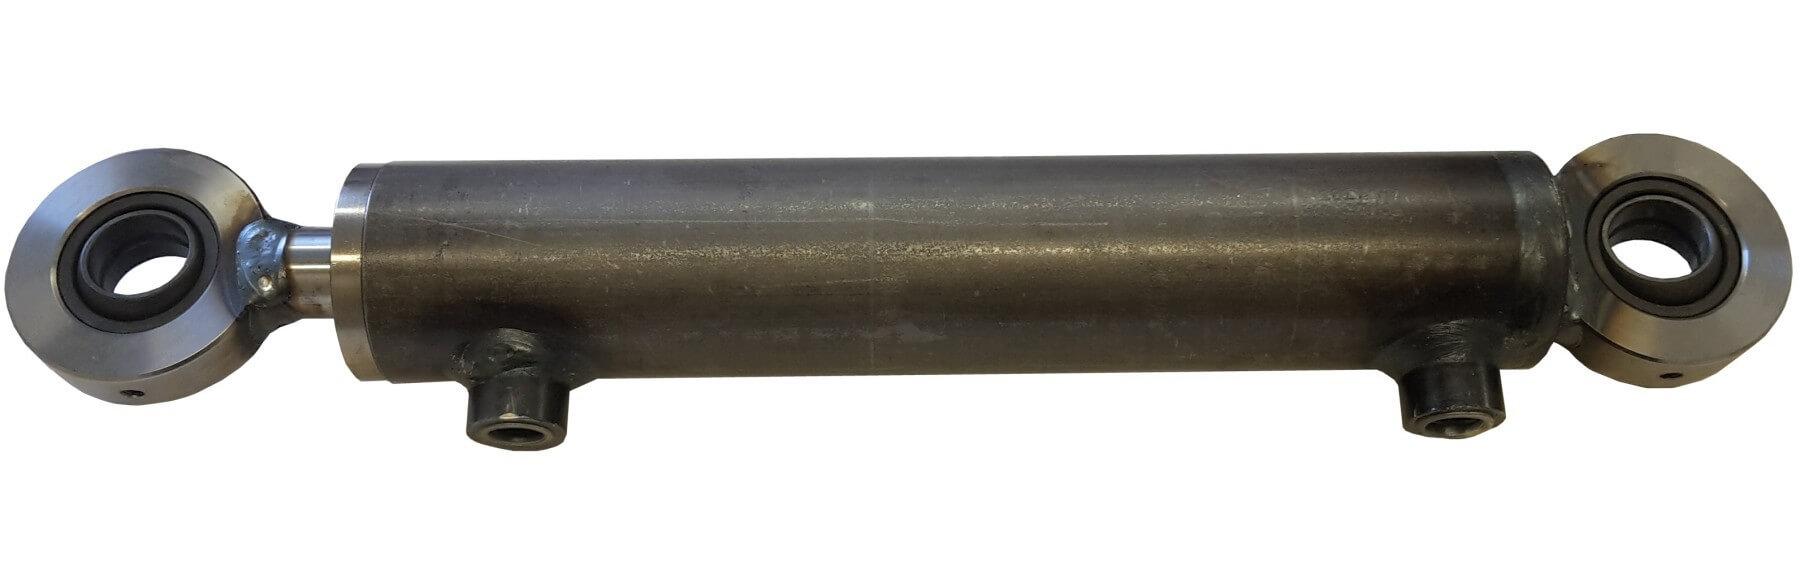 Hydraulisylinteri CL 80. 50. 200 GE